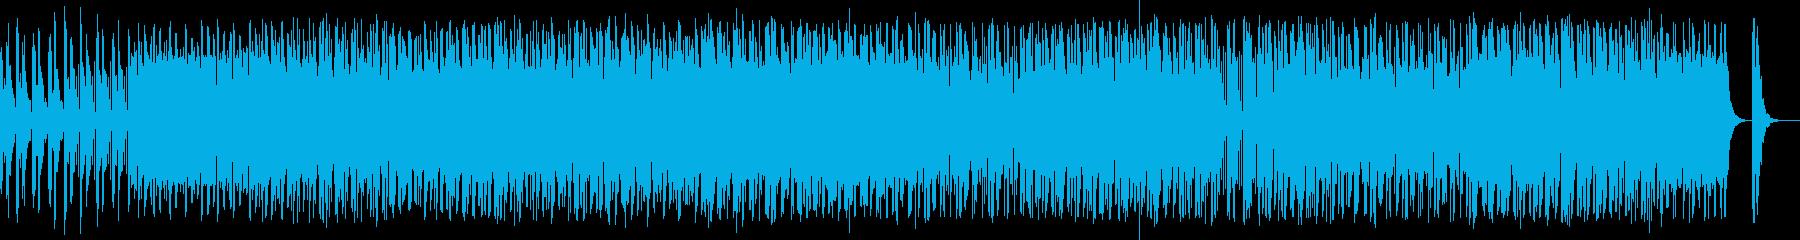 anvihimon2_seventの再生済みの波形